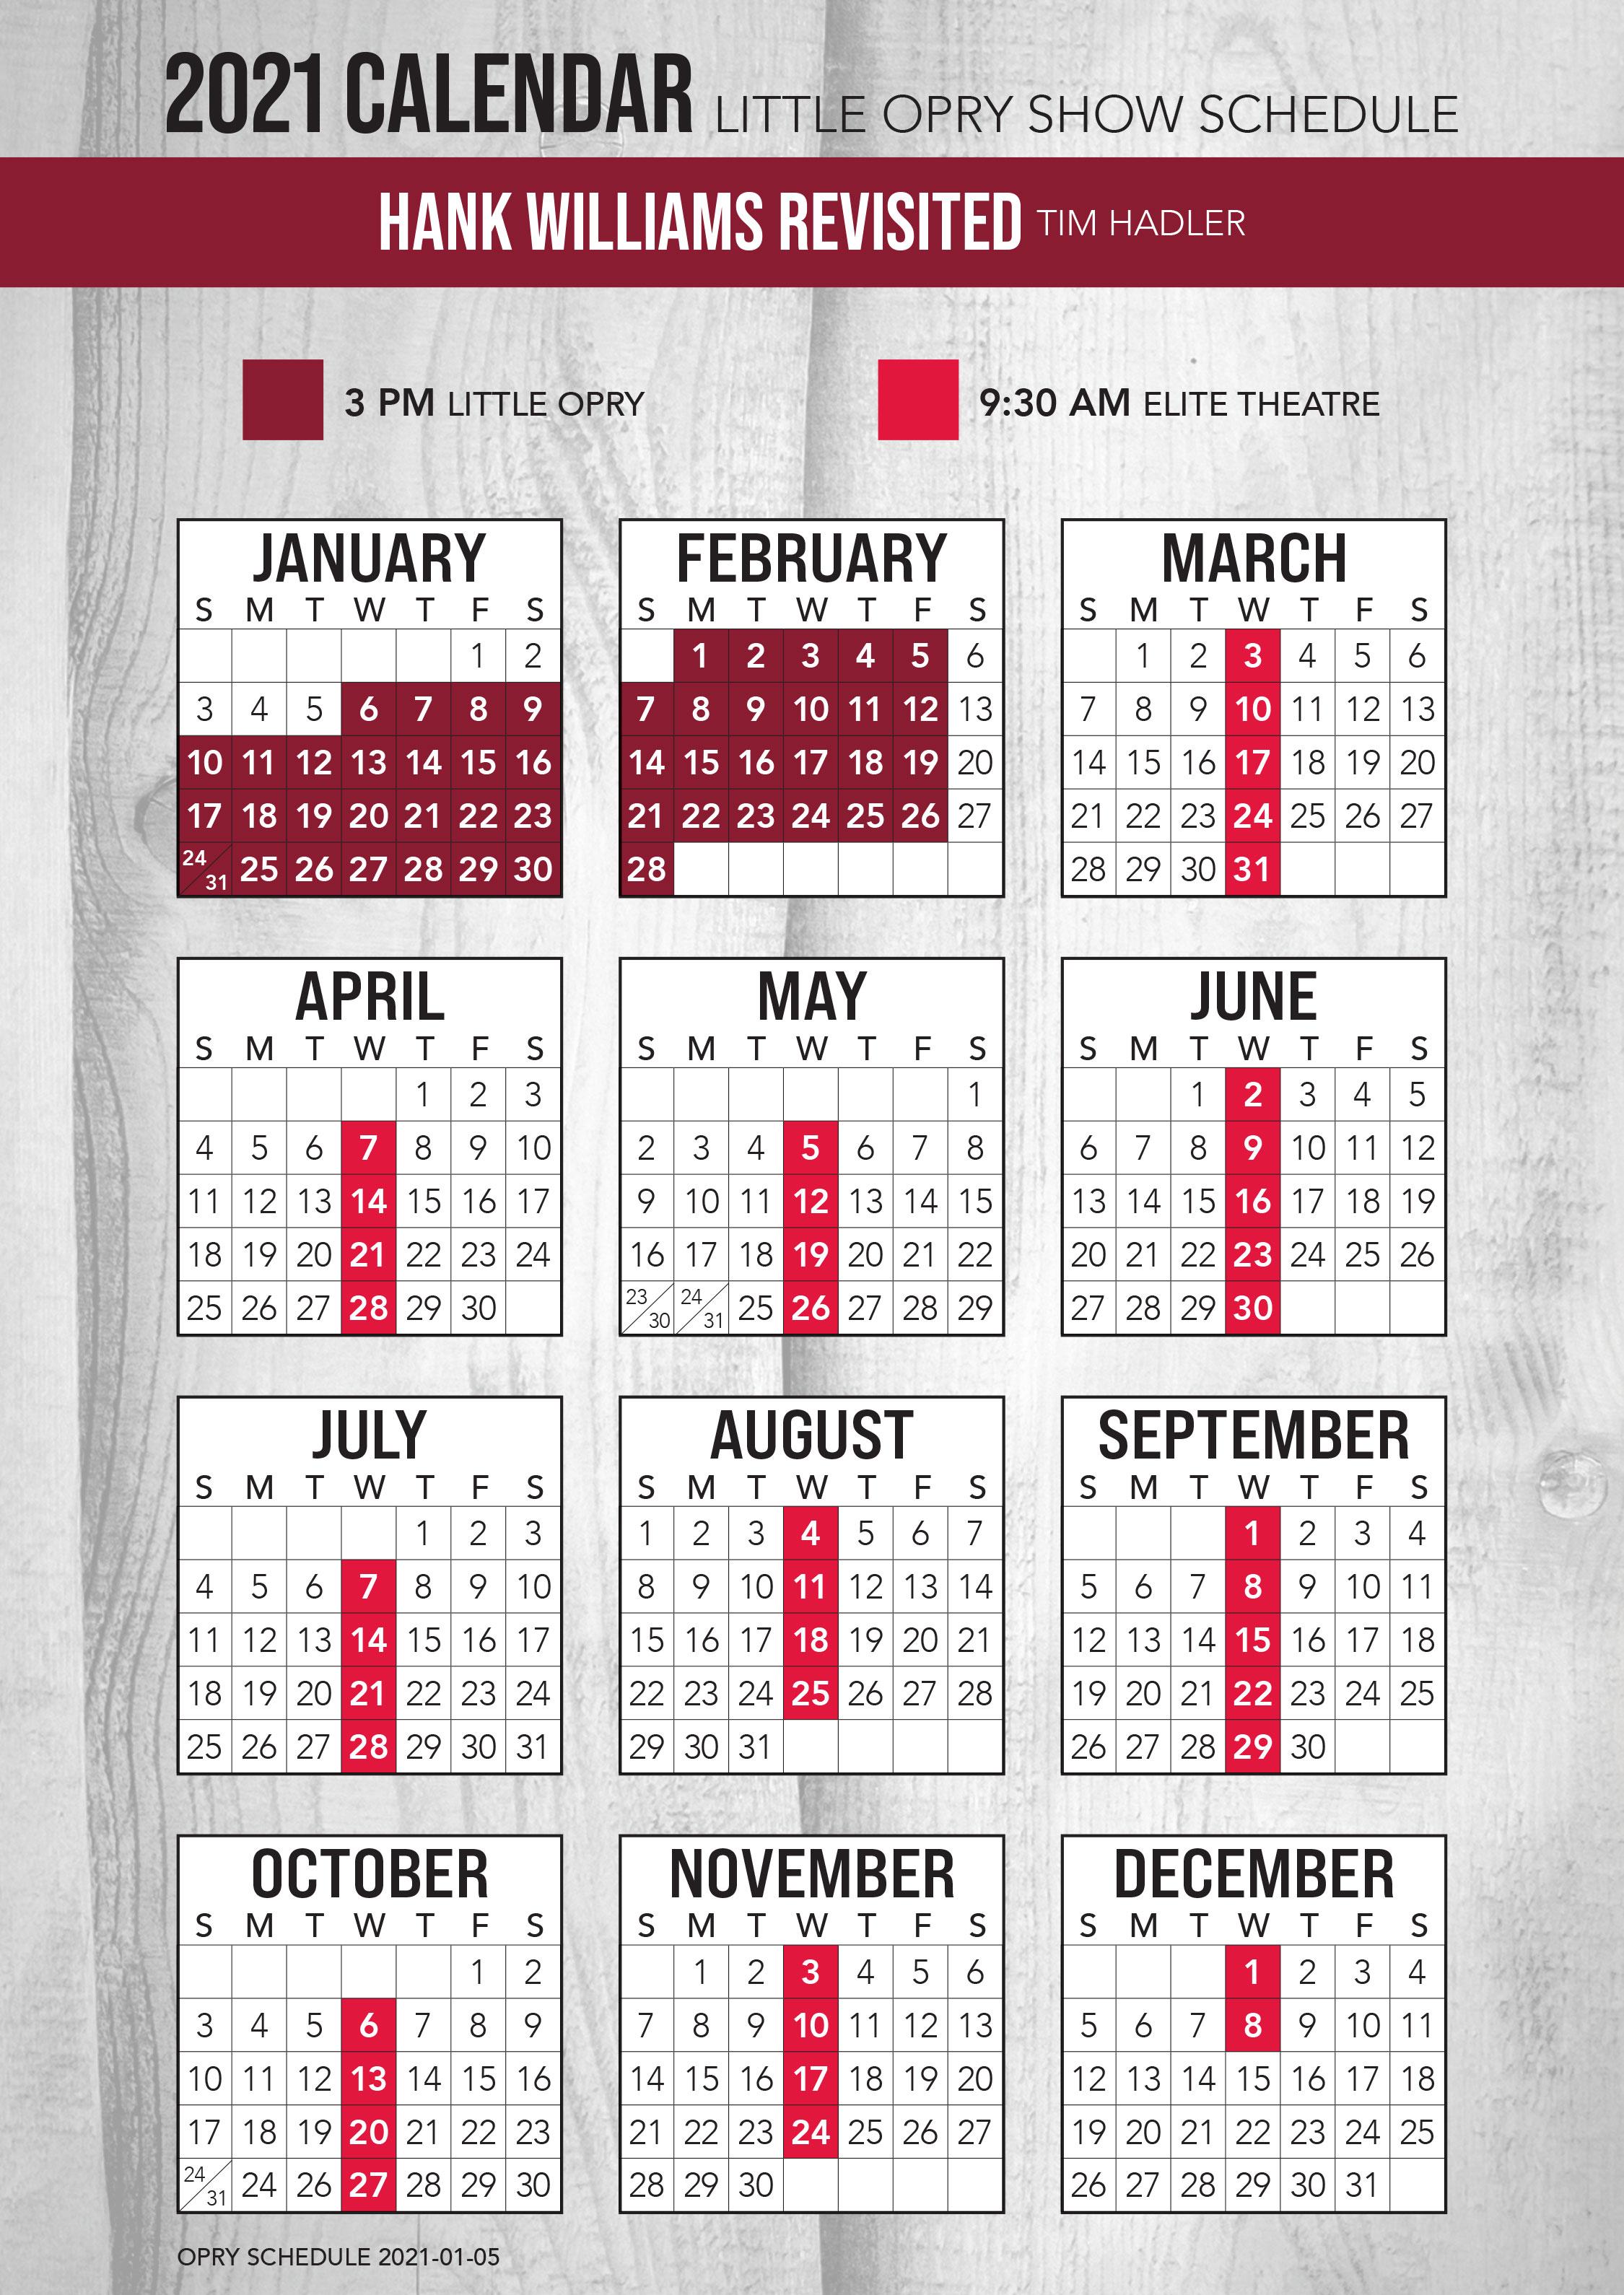 Hank Williams Revisited 2021 Schedule